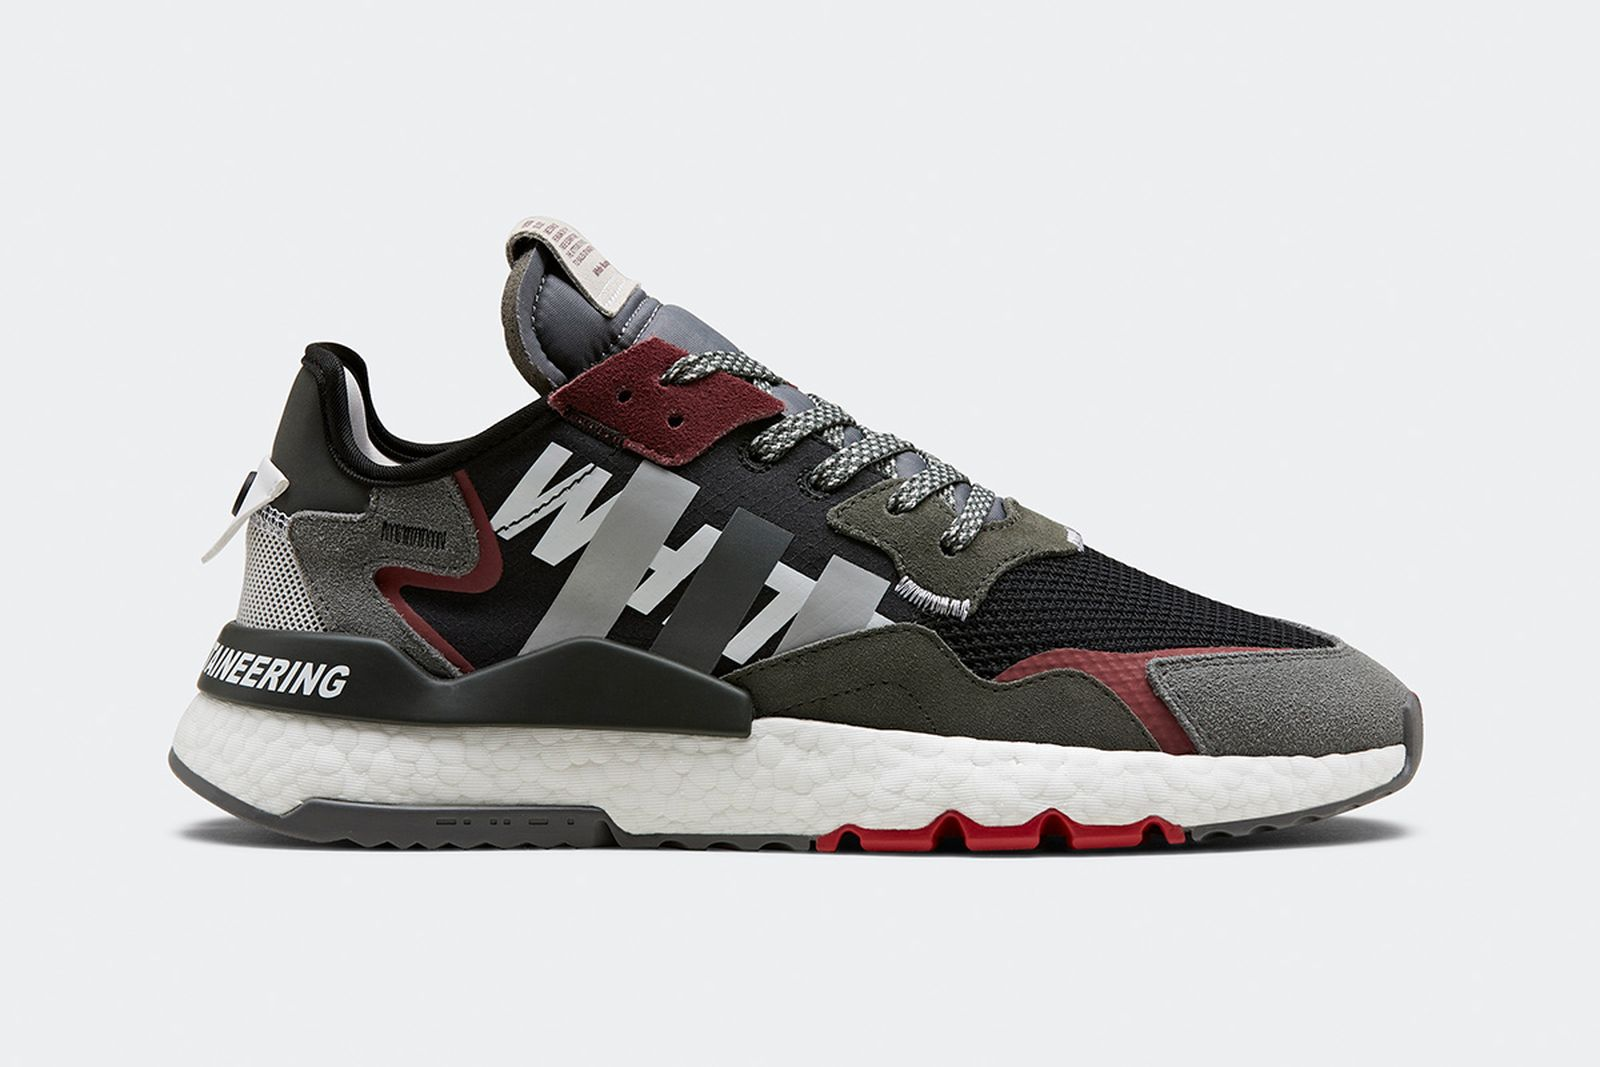 white mountaineering adidas originals nite jogger release date price